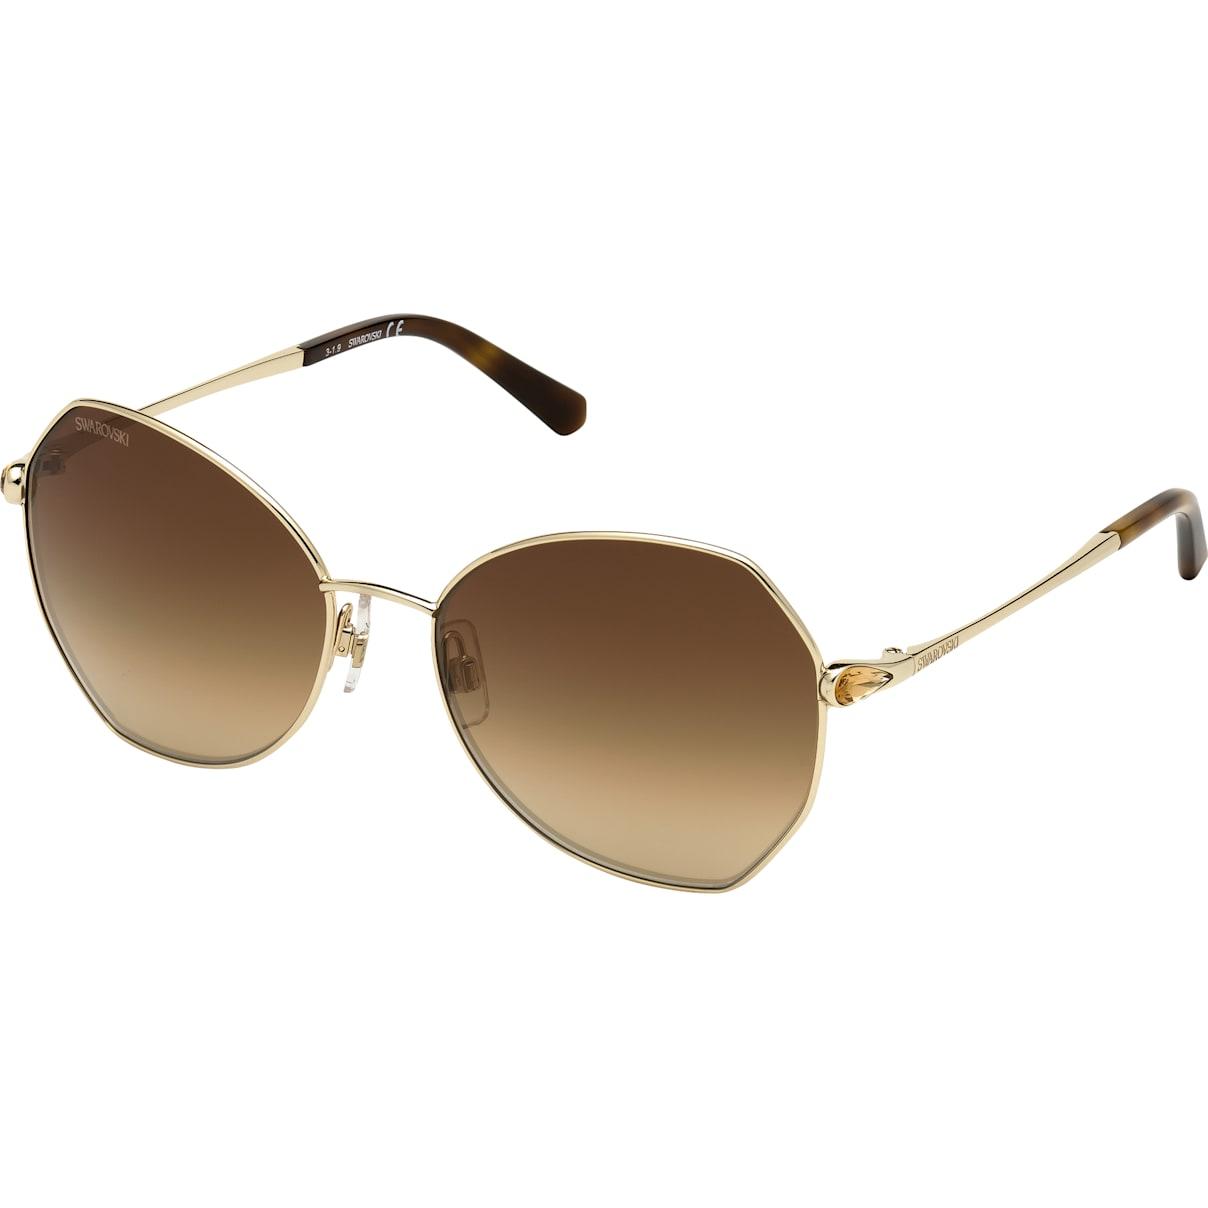 Swarovski Swarovski Sunglasses, SK266 - 32G, Brown